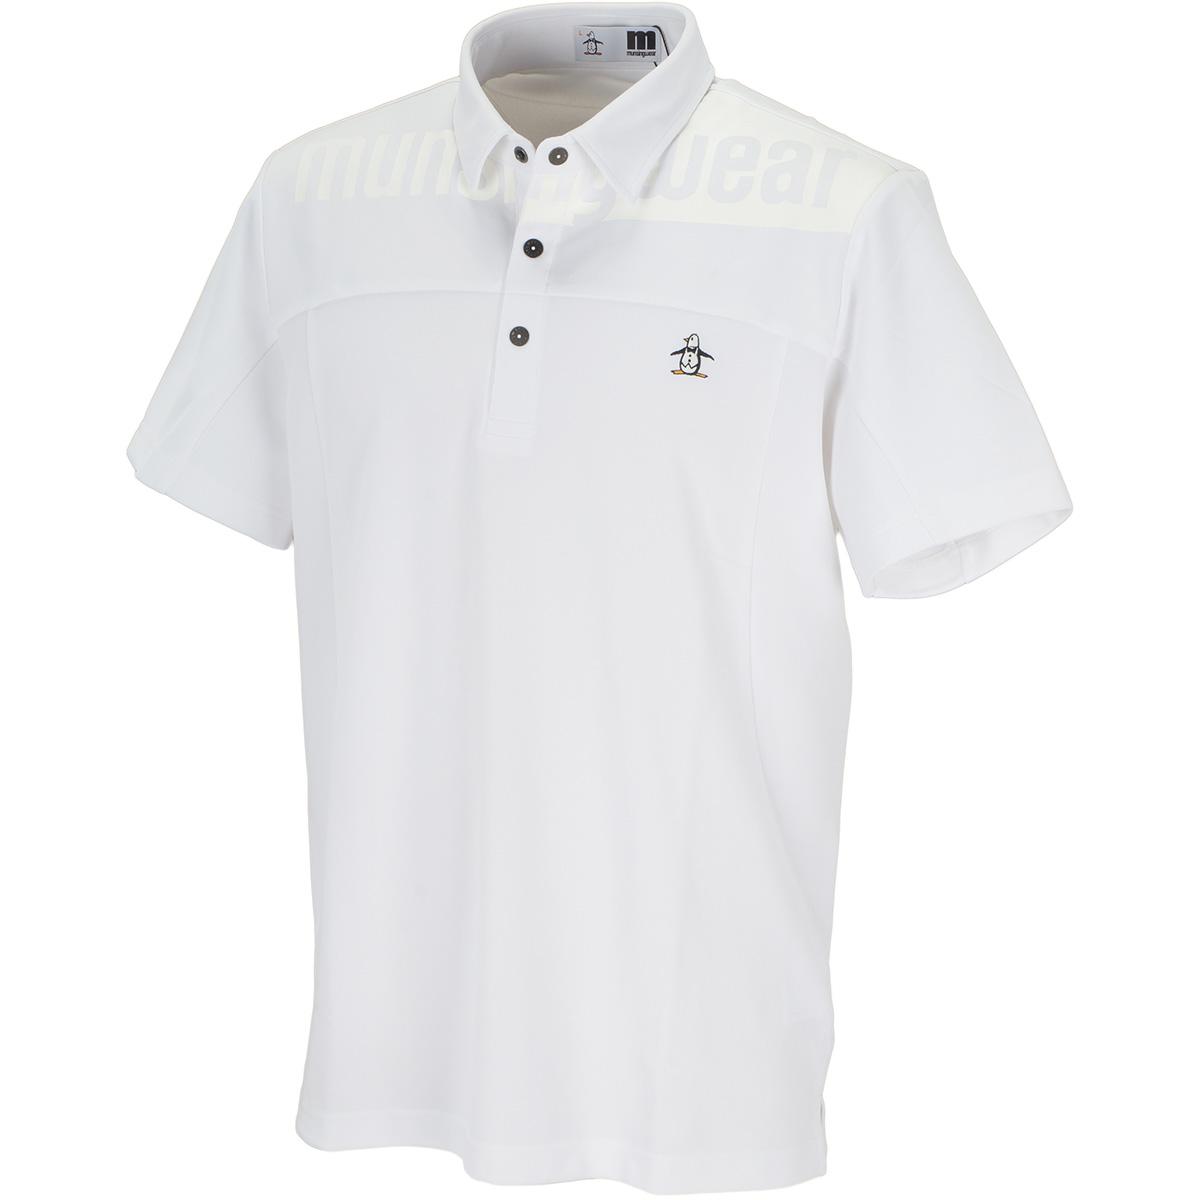 ENVOY COOLISTラバーロゴ半袖ポロシャツ